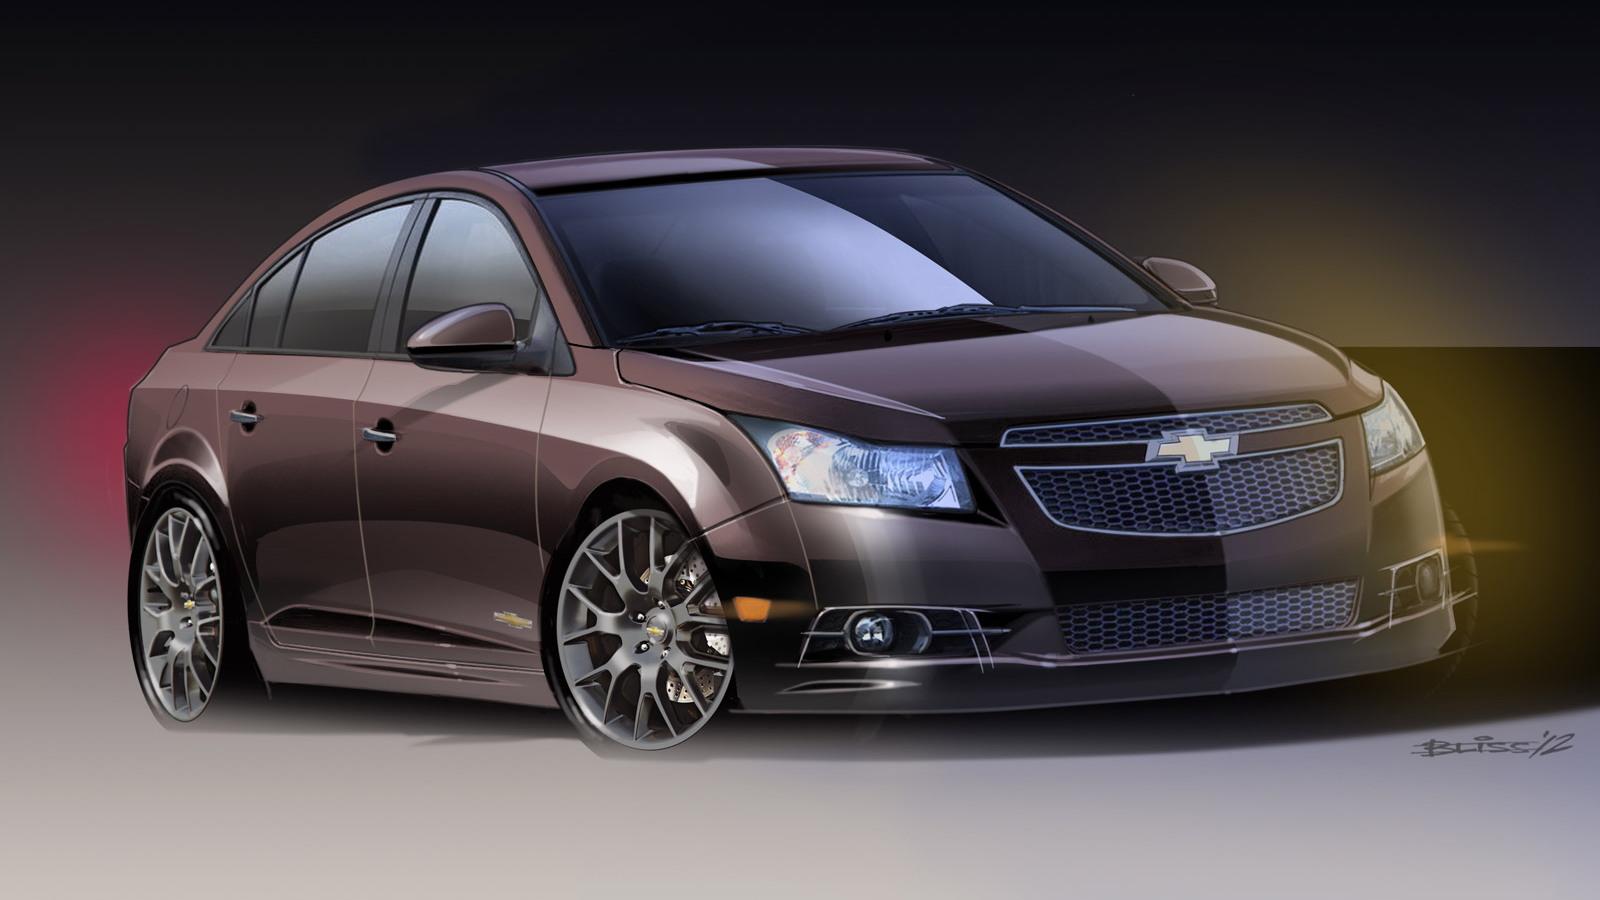 Chevrolet Cruze Upscale 2012 SEMA concept